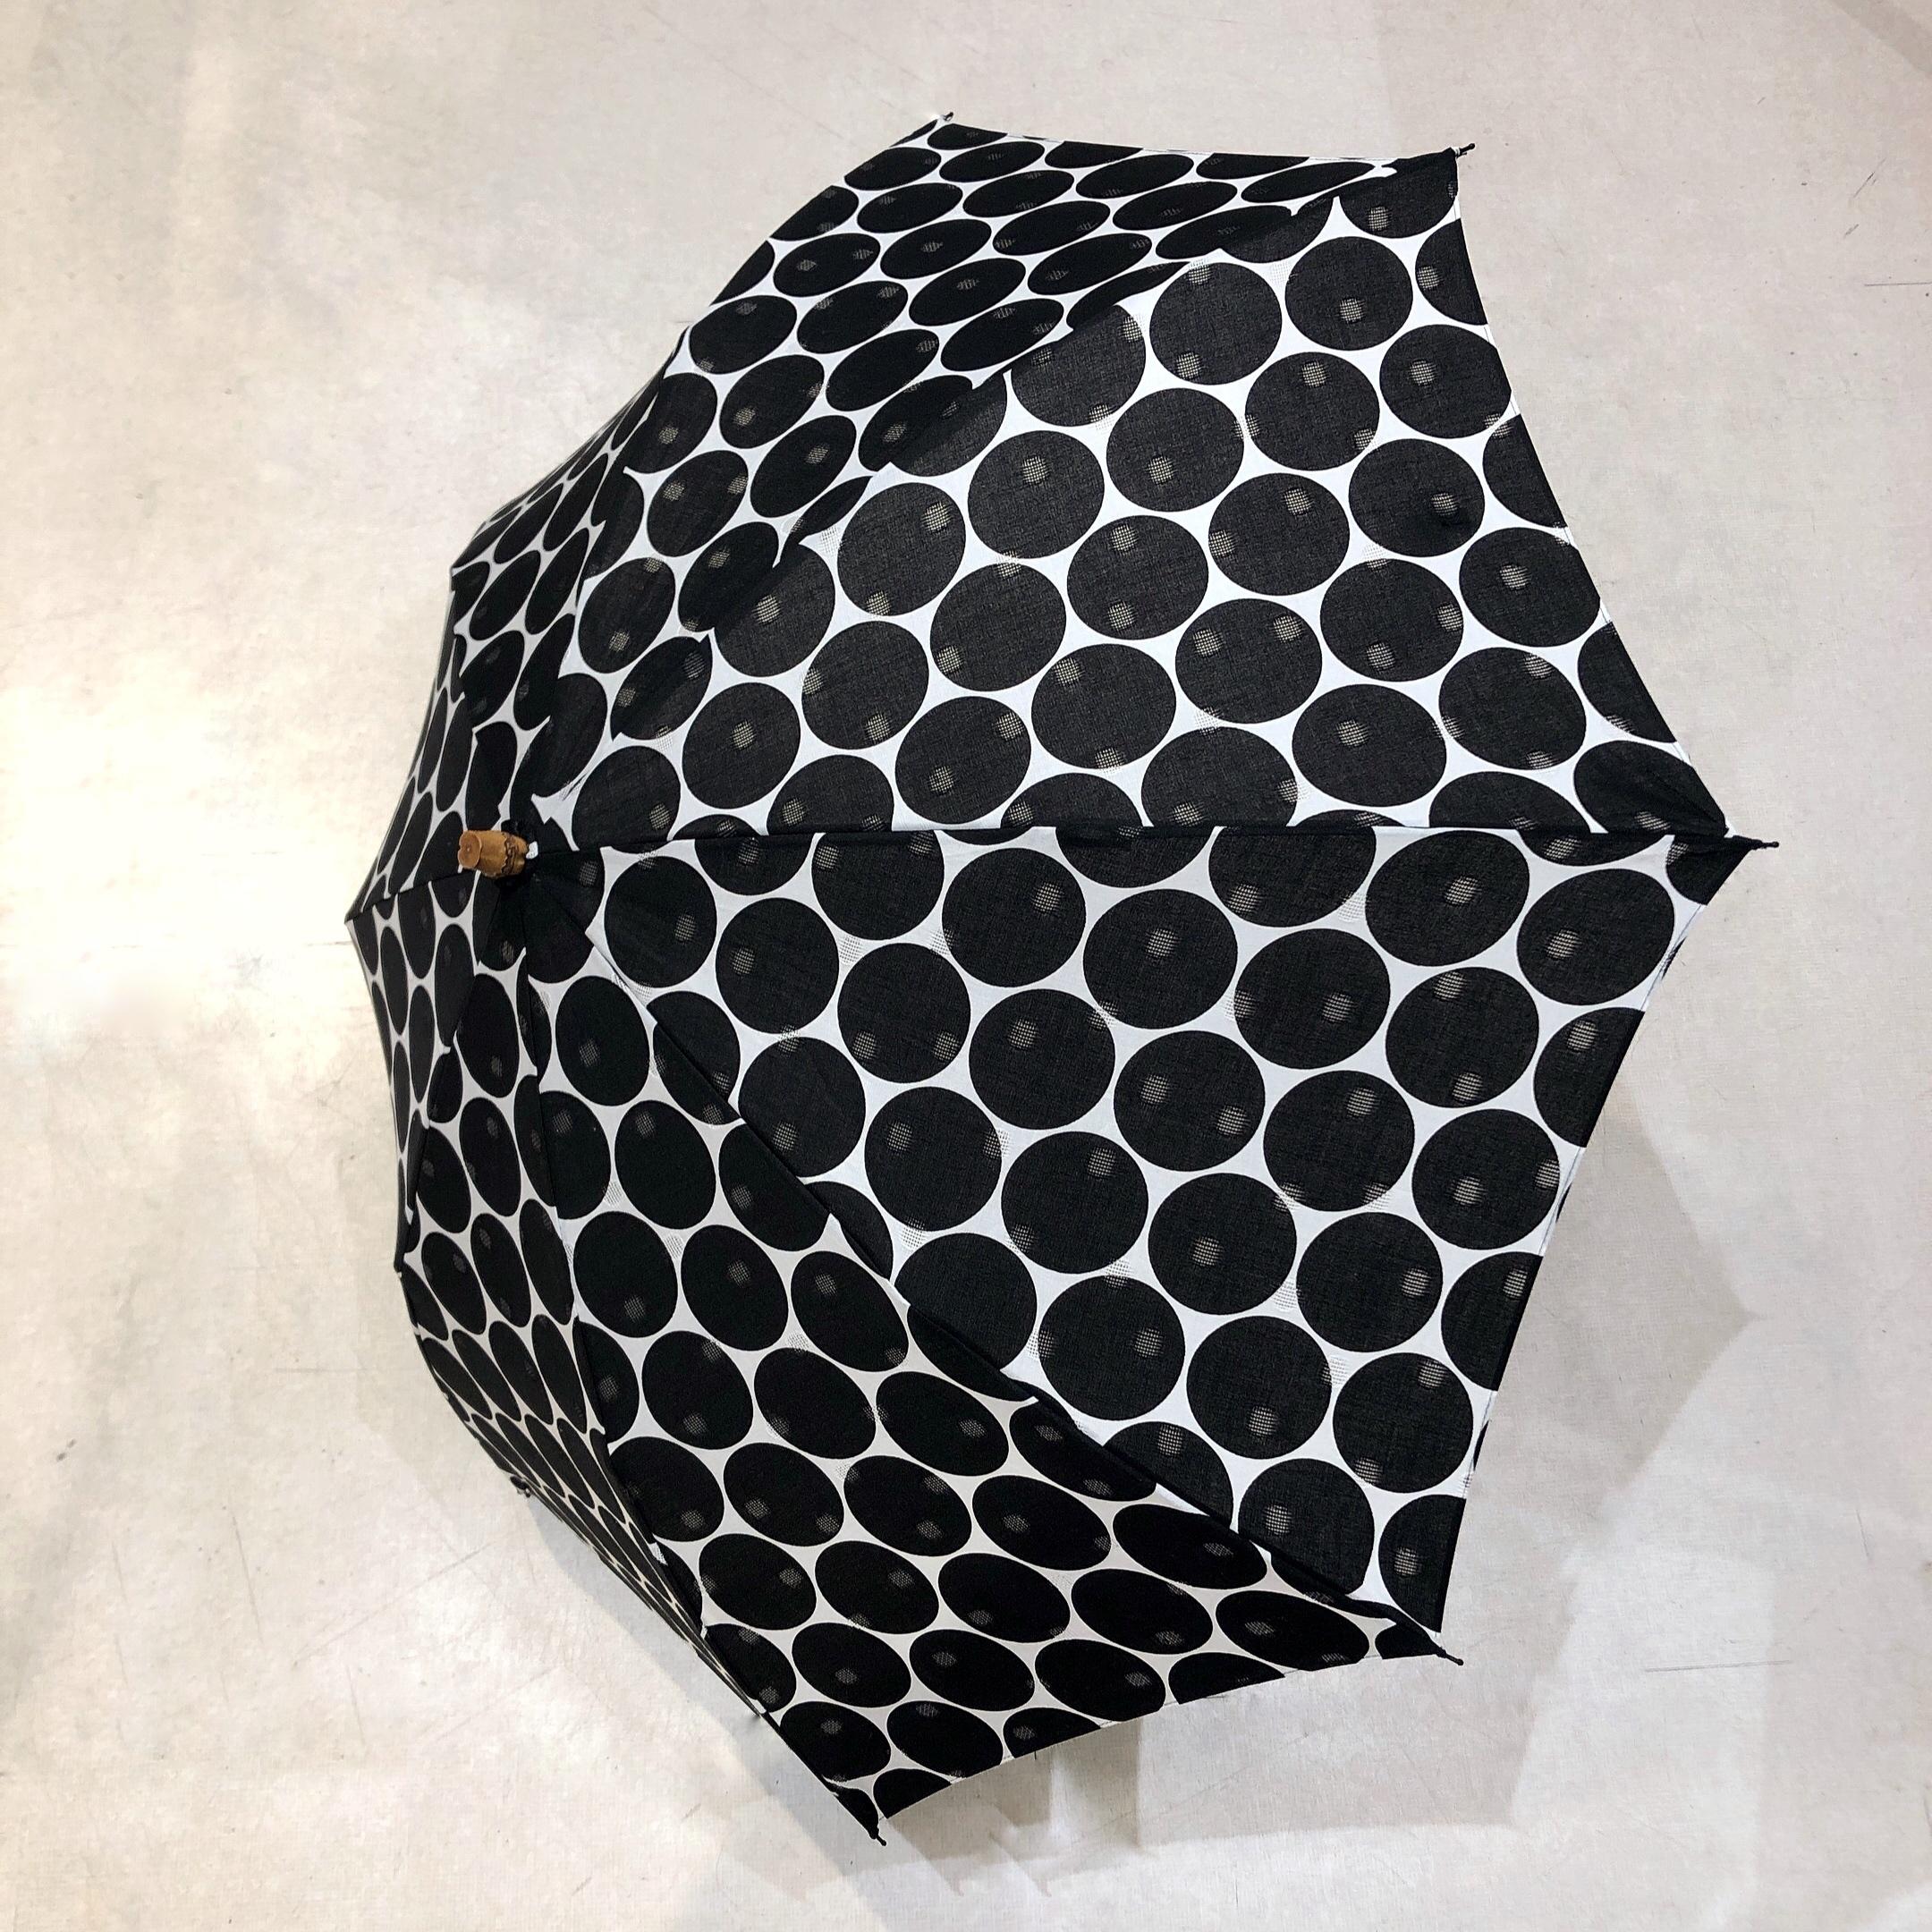 SUR MER (シュールメール) 日本製 折り畳み日傘 DOT 透かし水玉